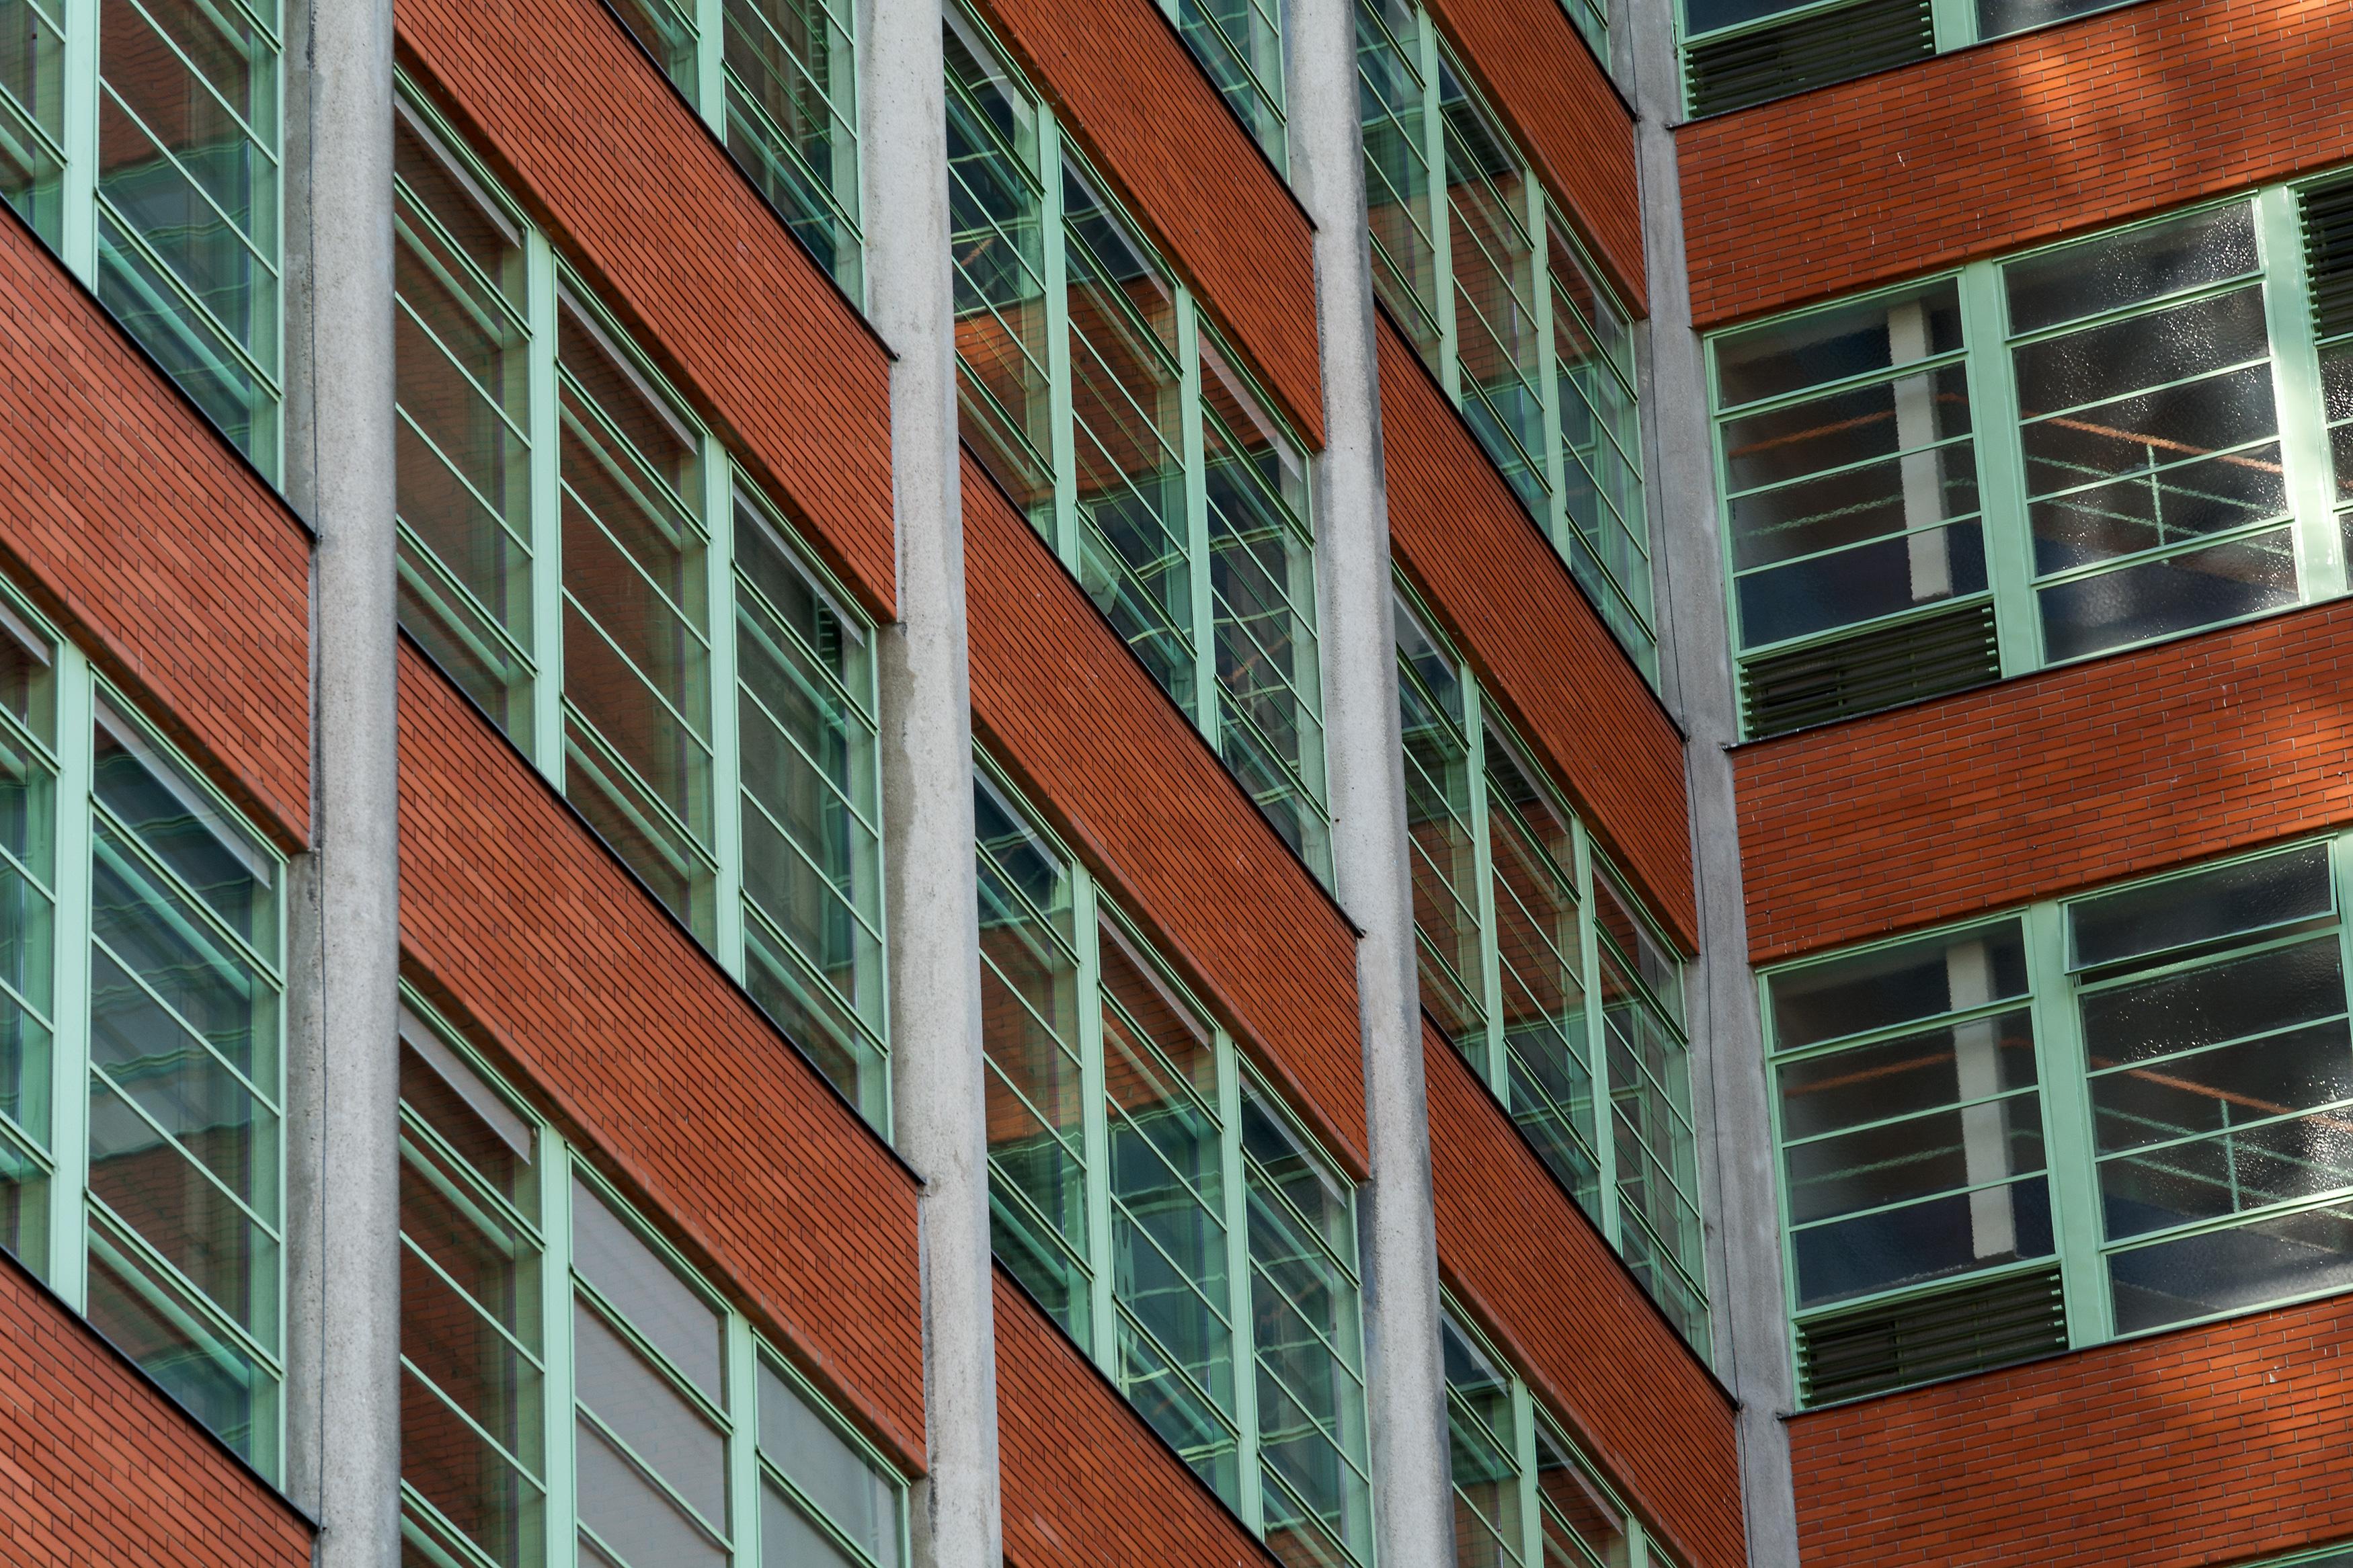 Brick Factory House Close-Up - FREE image on LibreShot